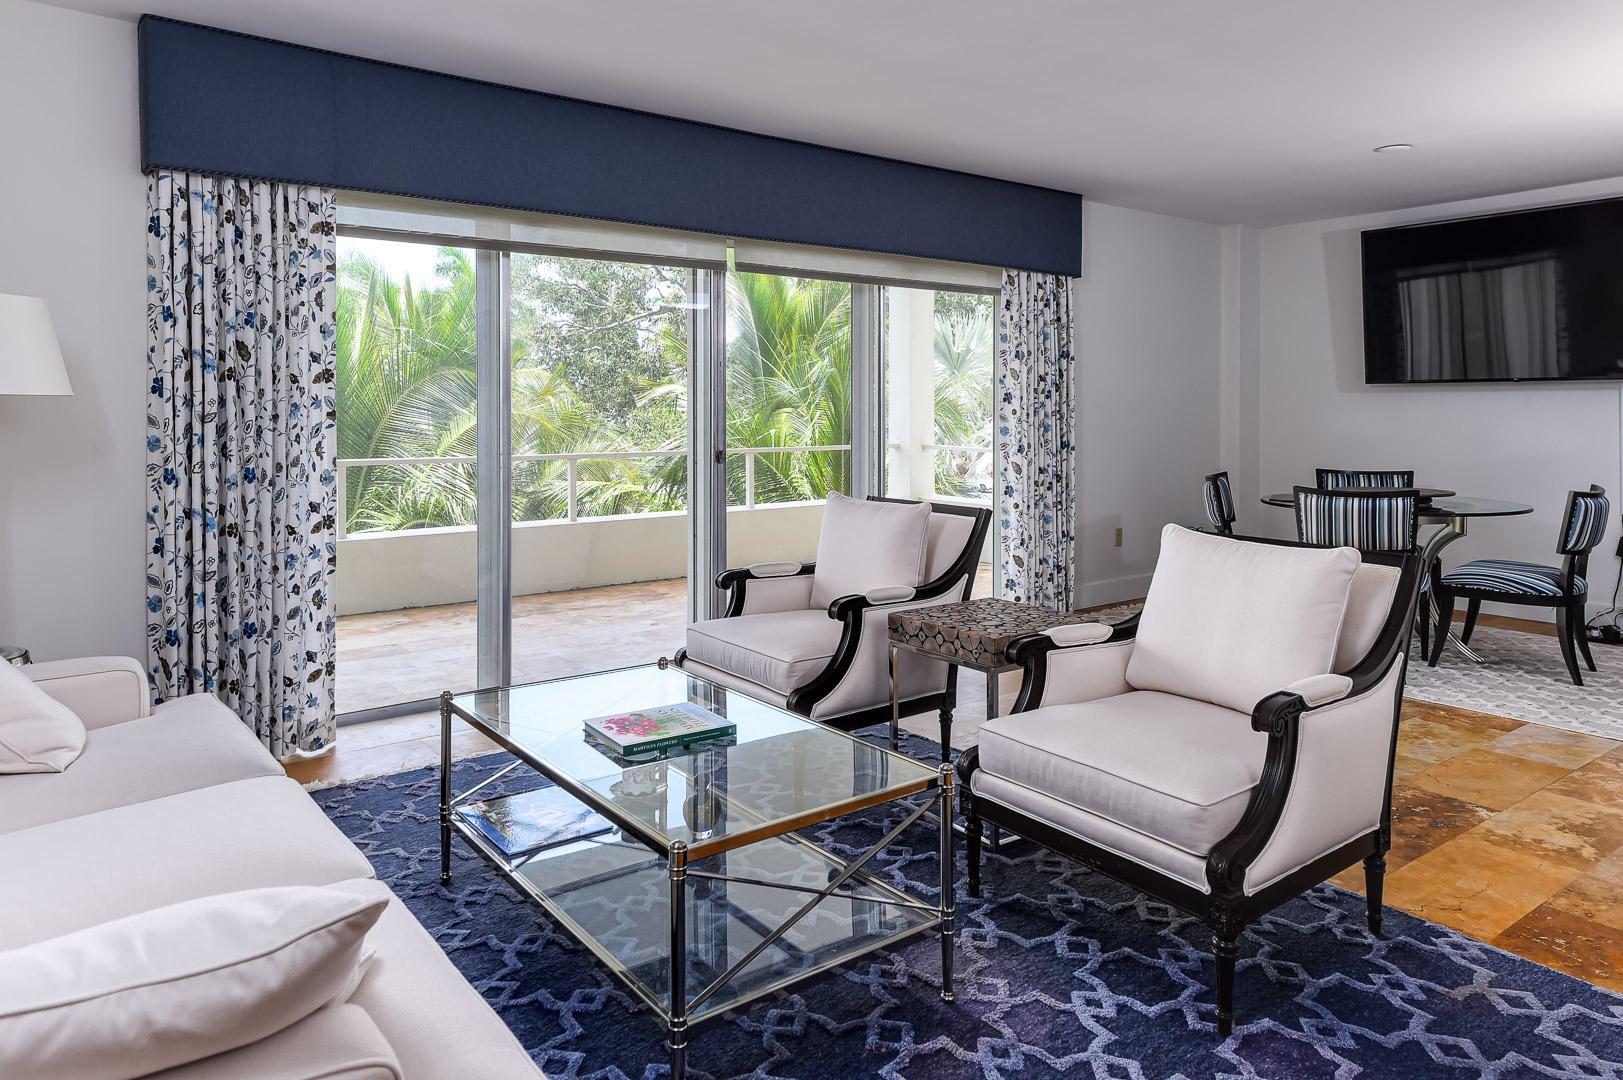 44 Cocoanut Row #222a, Palm Beach, FL 33480 - #: RX-10627413